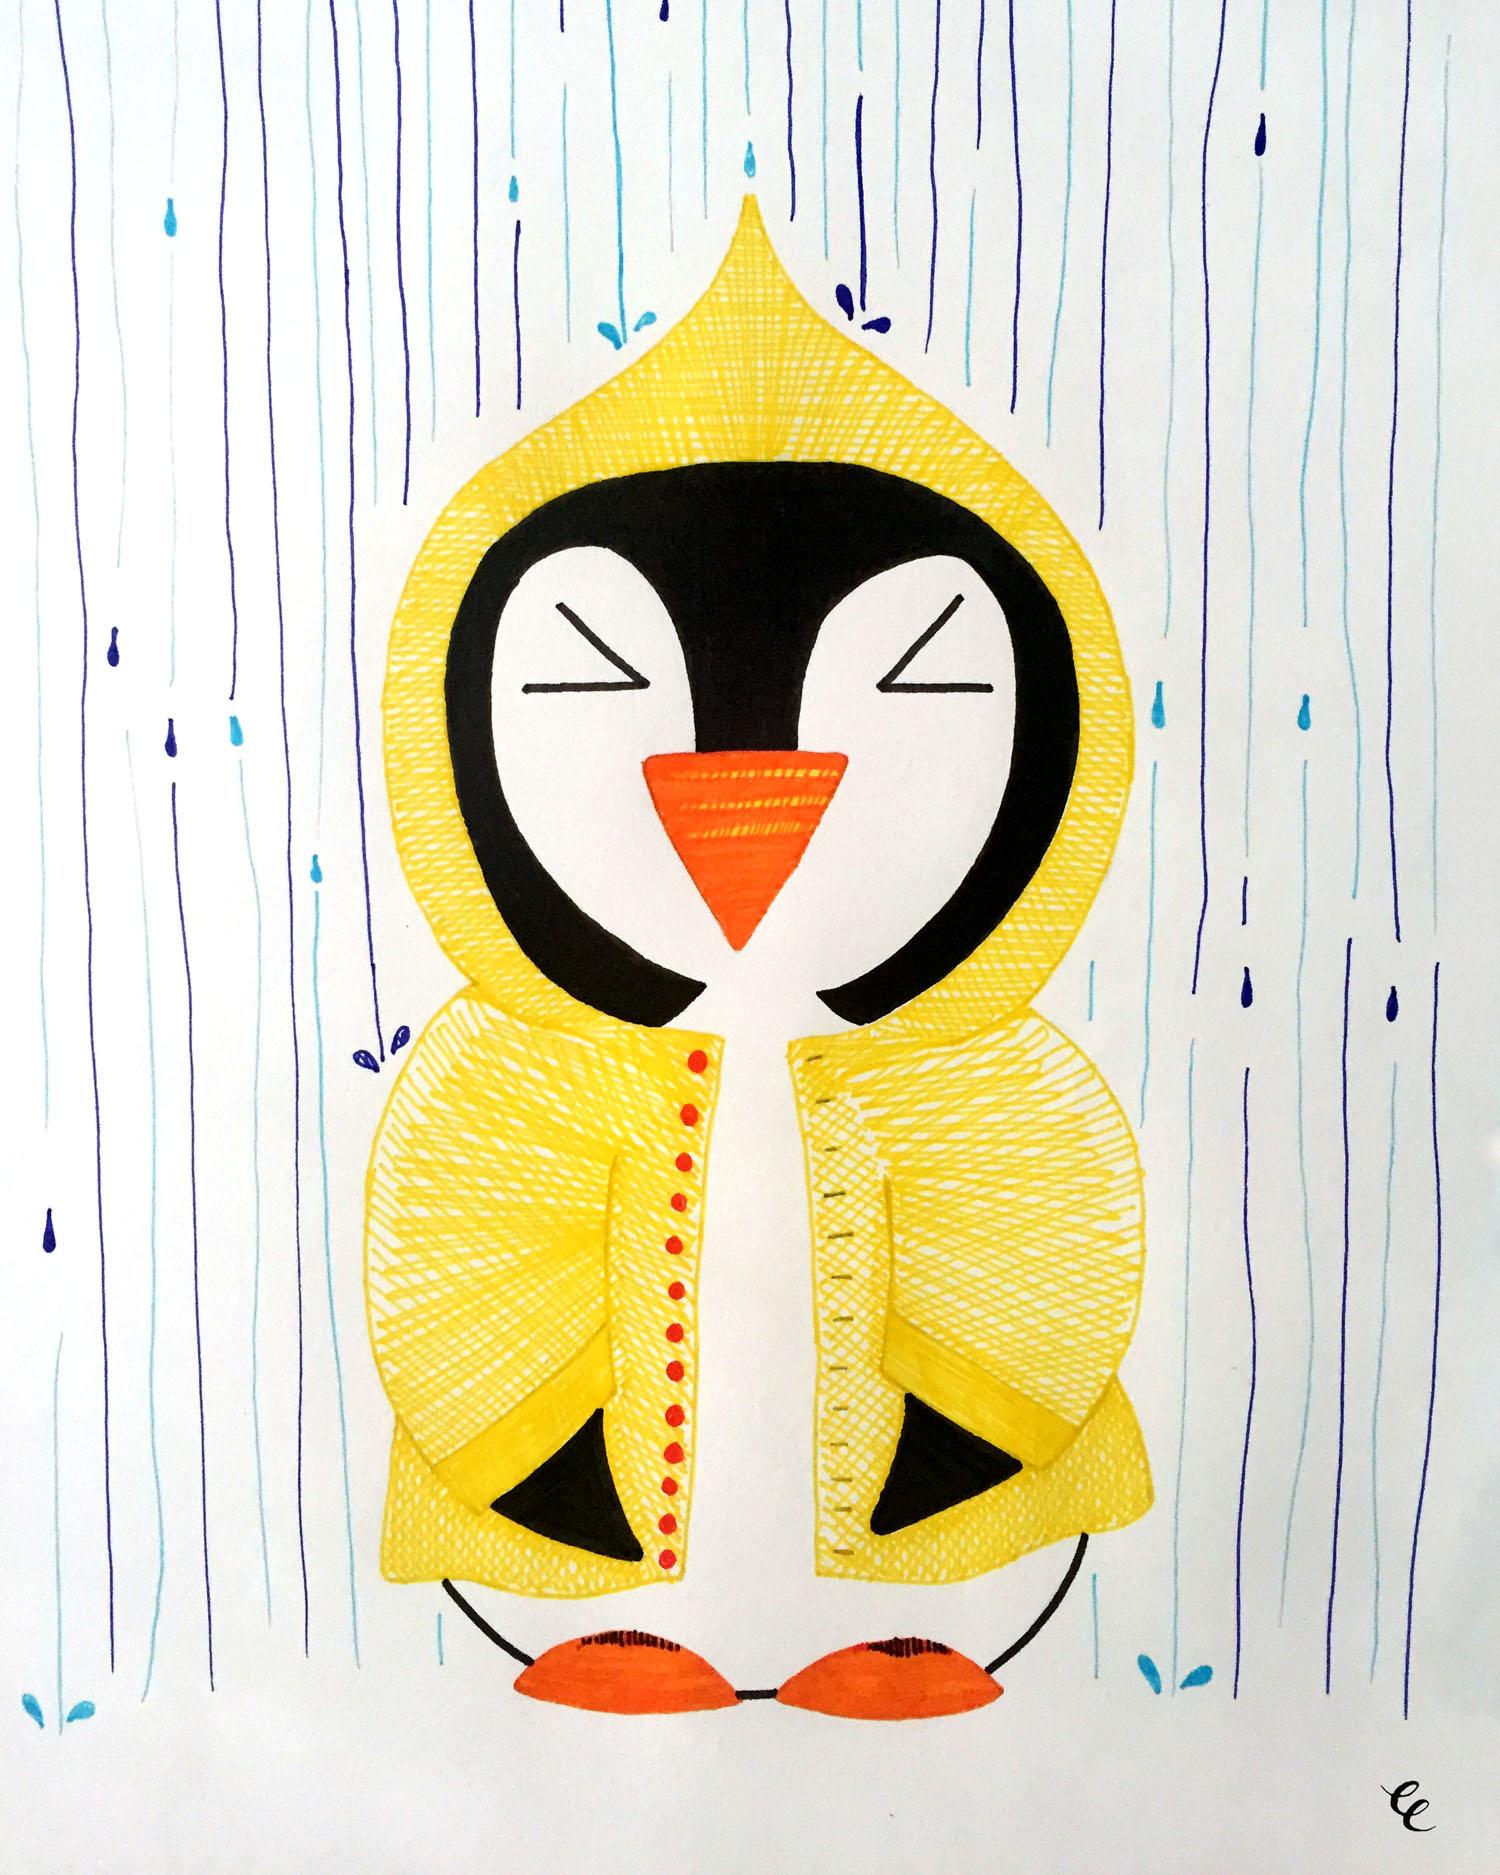 WEEK 23:  a Wet Penguin